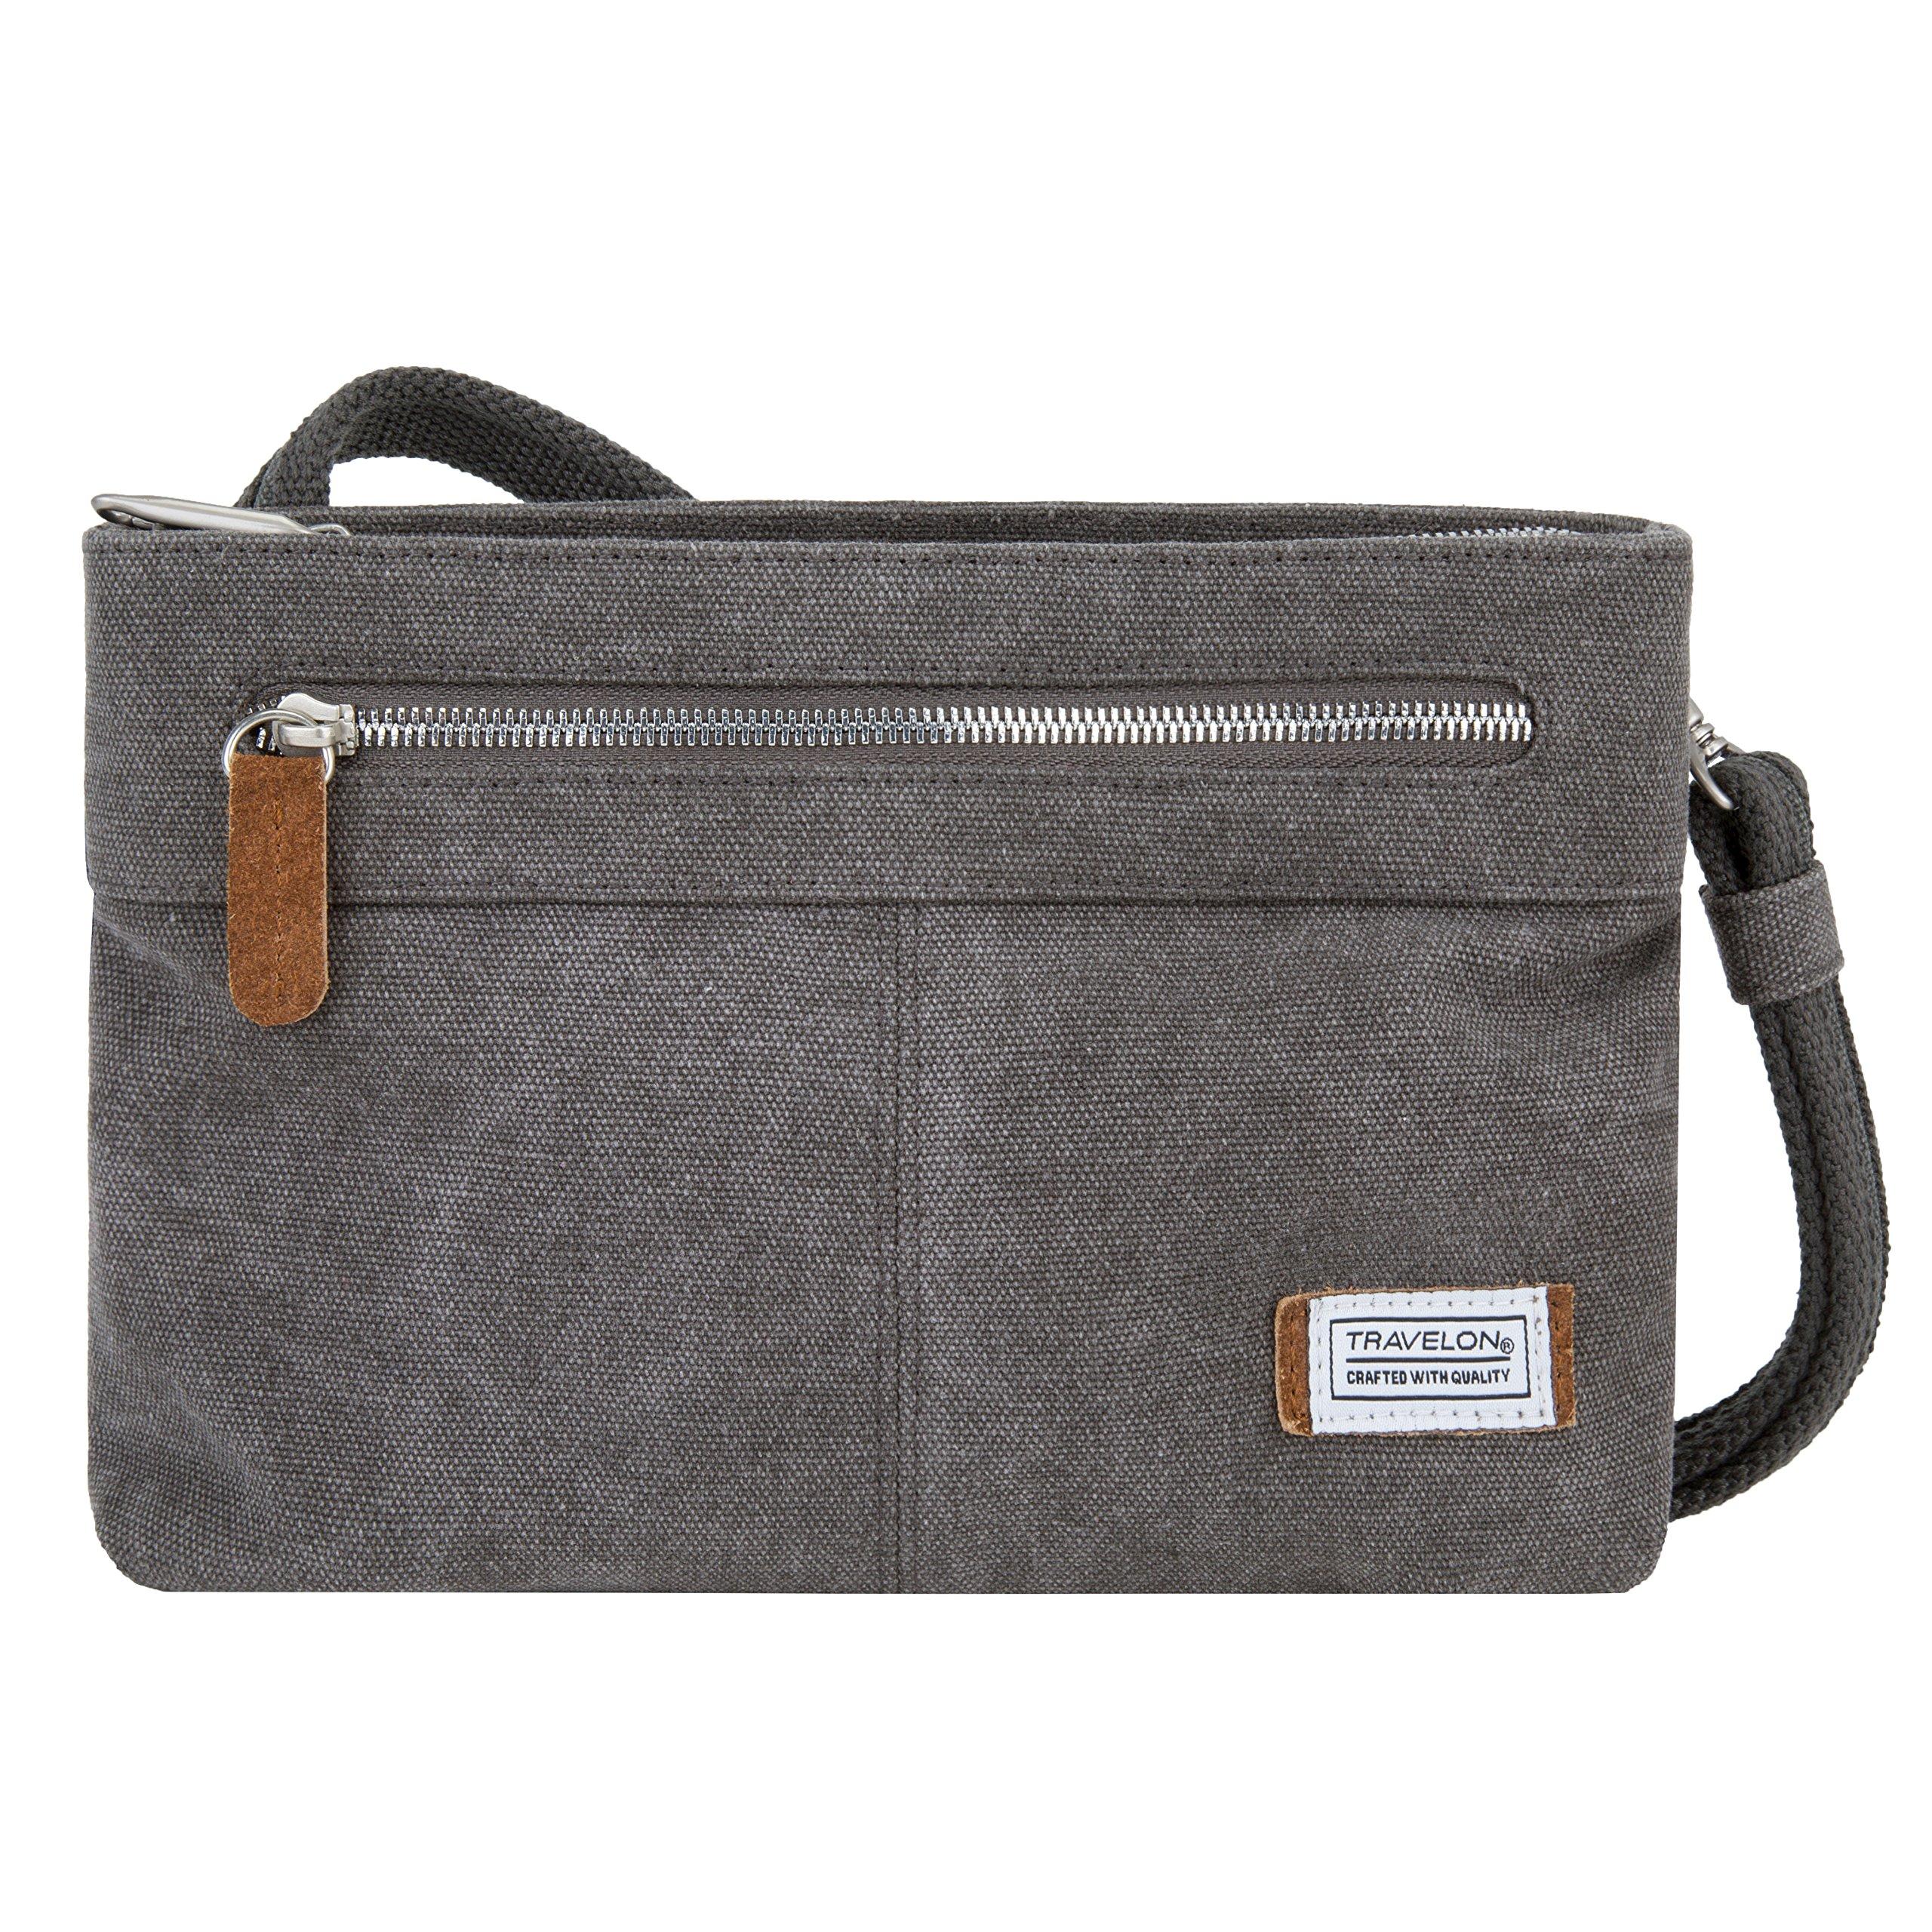 Travelon Women's Anti-Theft Heritage Small Crossbody Cross Body Bag, Pewter, One Size - 33226 540 by Travelon